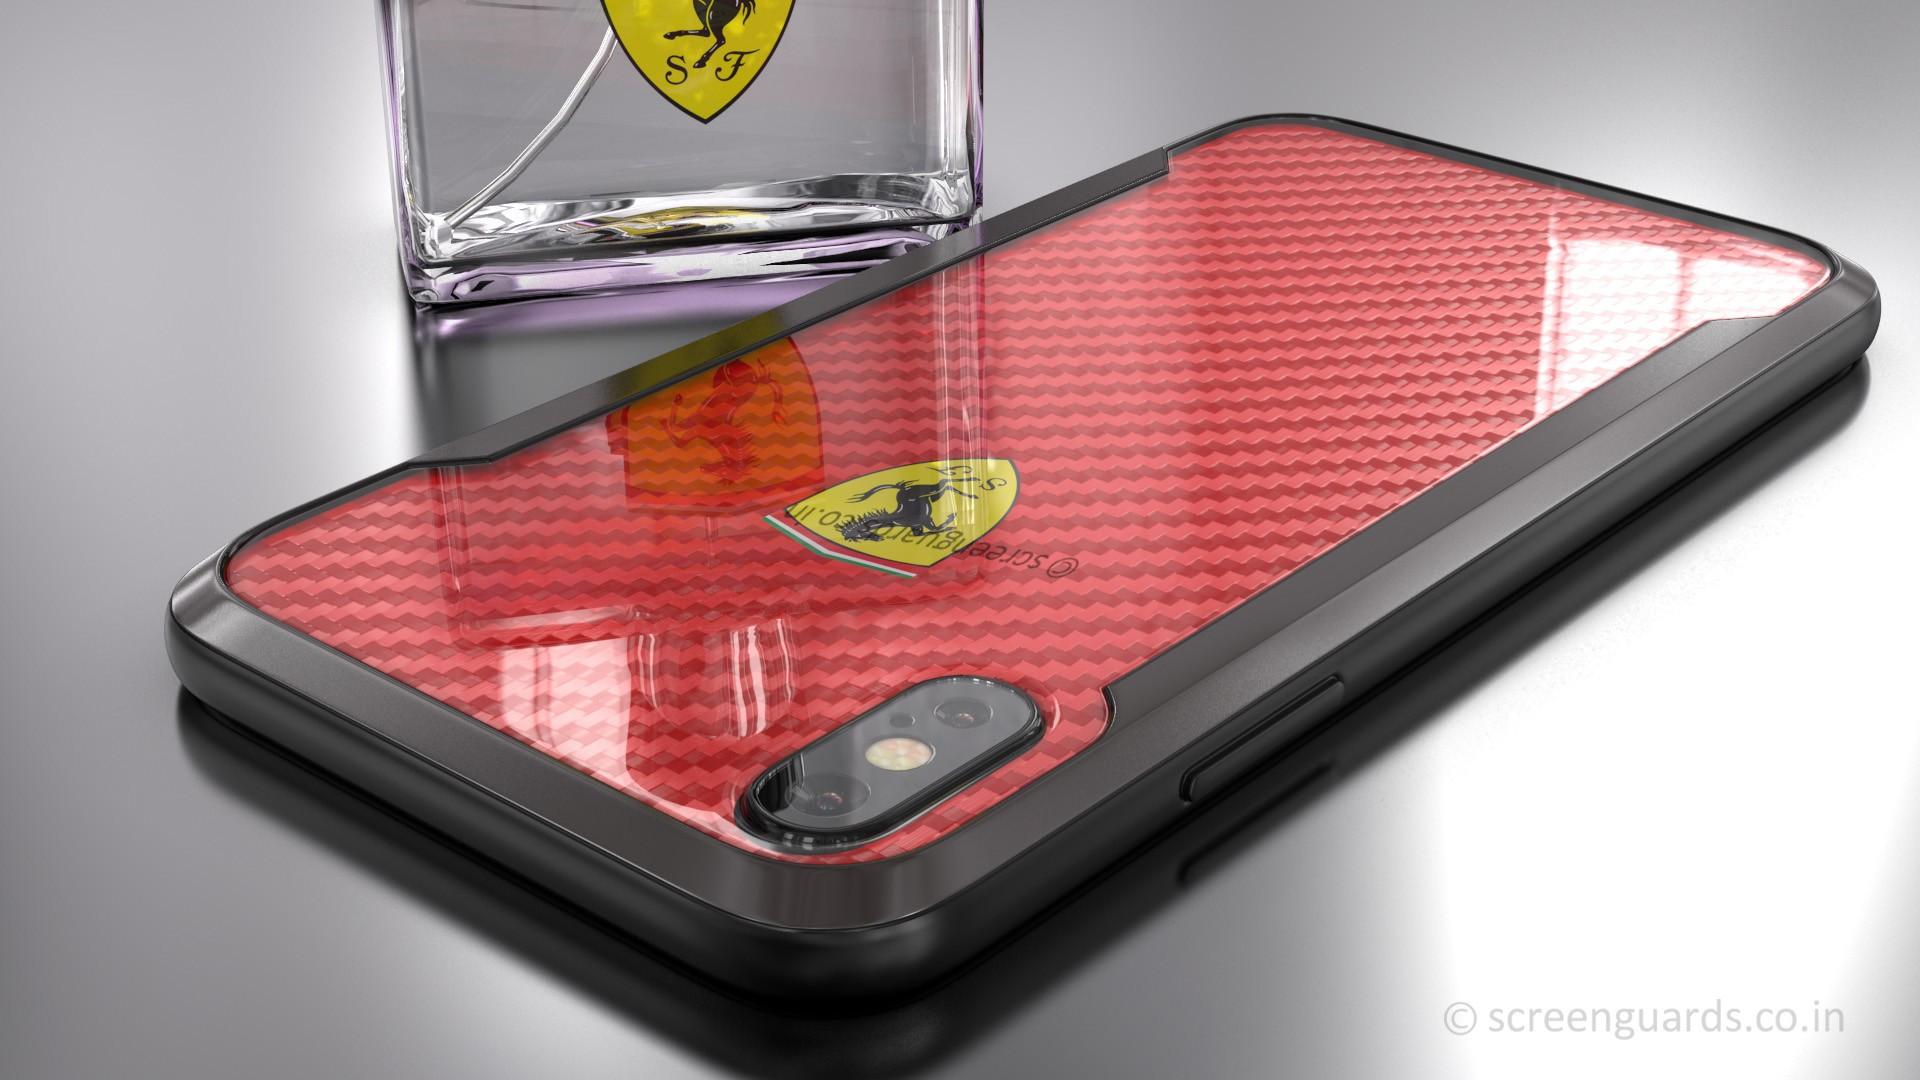 Ferrari Iphone X Aperta Ultra Thin With Carbon Fiber Ferrari Logo Wallpaper Iphone X 1920x1080 Wallpaper Teahub Io